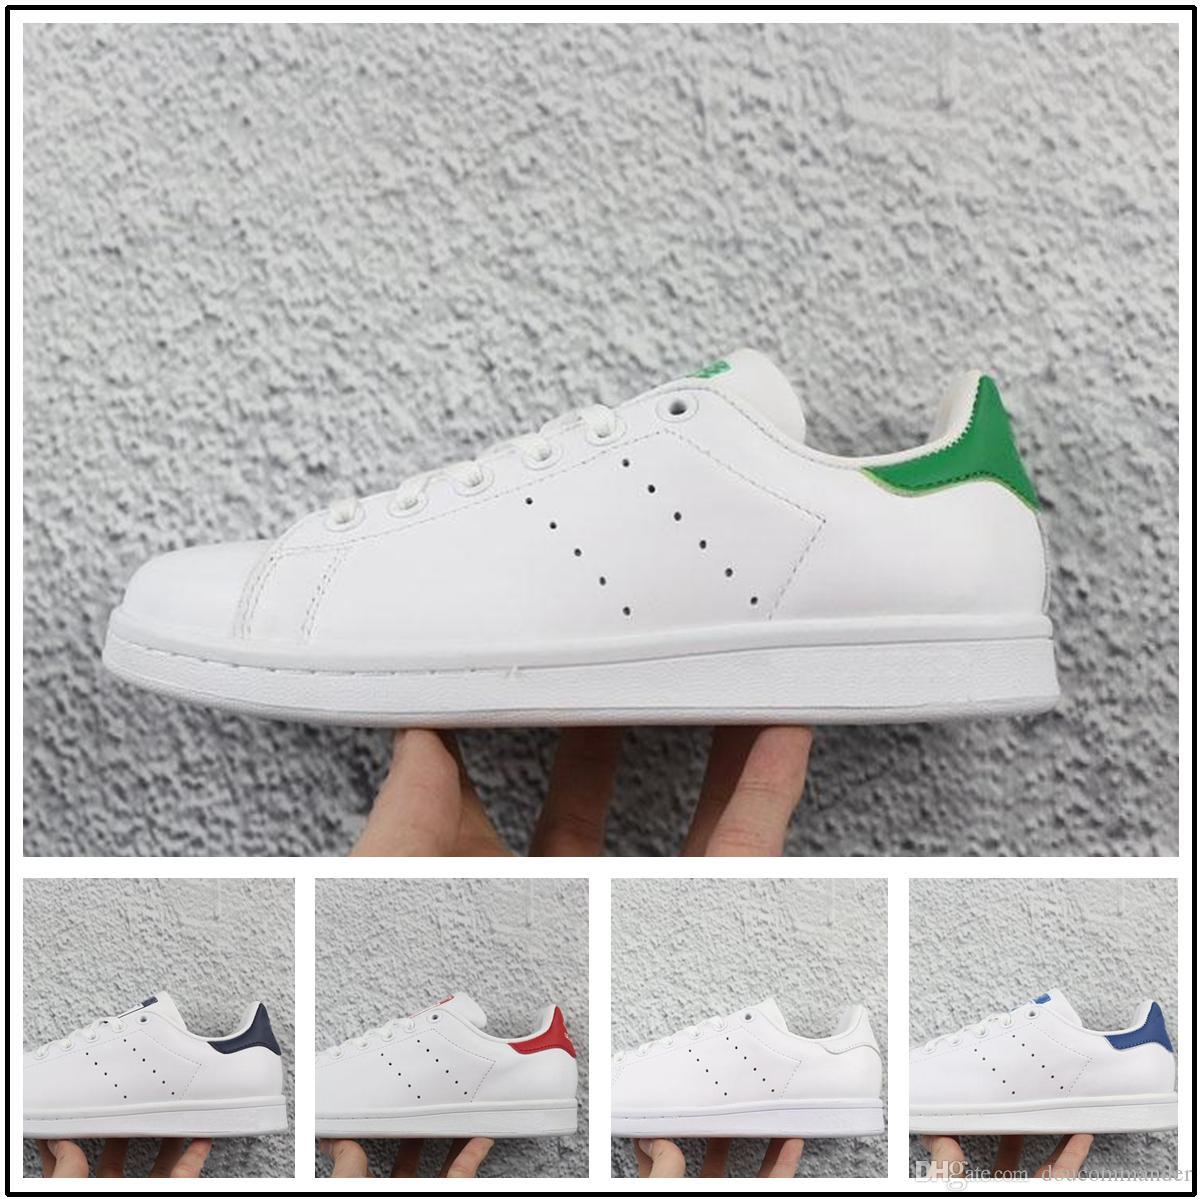 Adidas Superstar Hommes Femmes Primeknit X 2018 Nouvelle Arrivée Pharrell Casual Hu Smith Tennis Chaussures Williams Stan cFJK1l